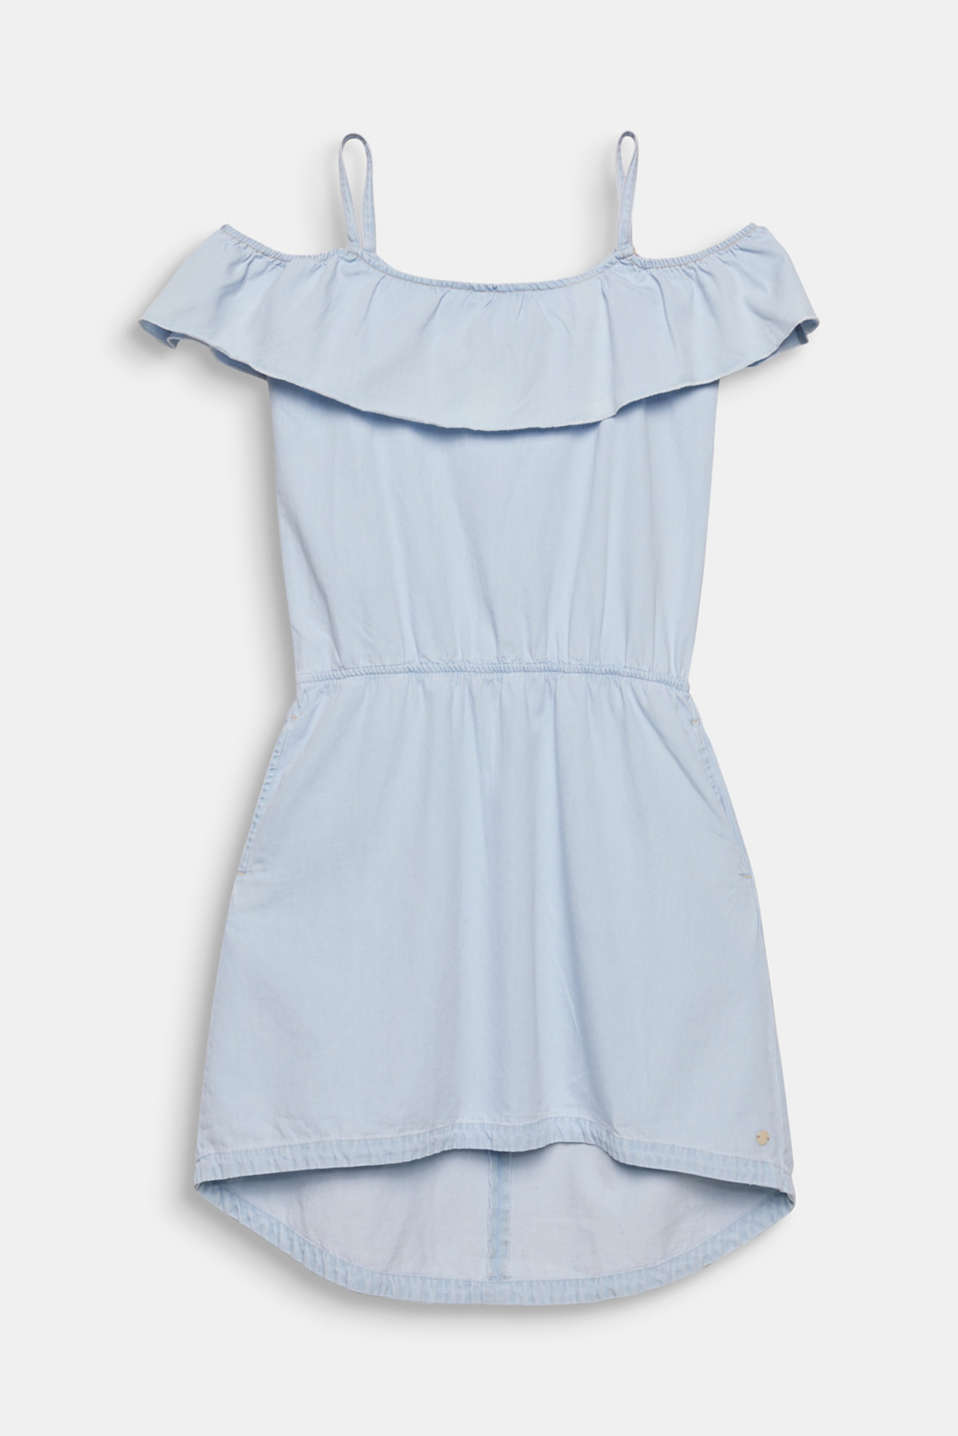 Spaghetti strap dress made of denim, 100% cotton, LCLIGHT INDIGO D, detail image number 0